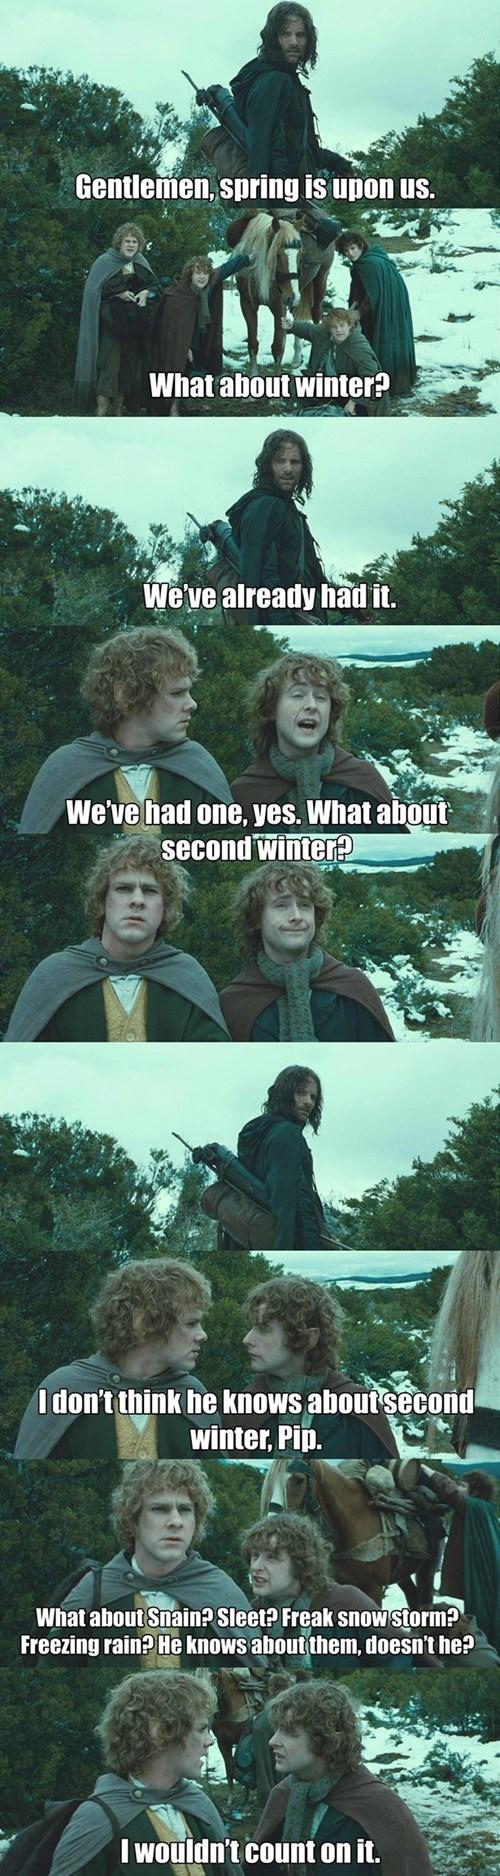 Winter Ain't Over Yet